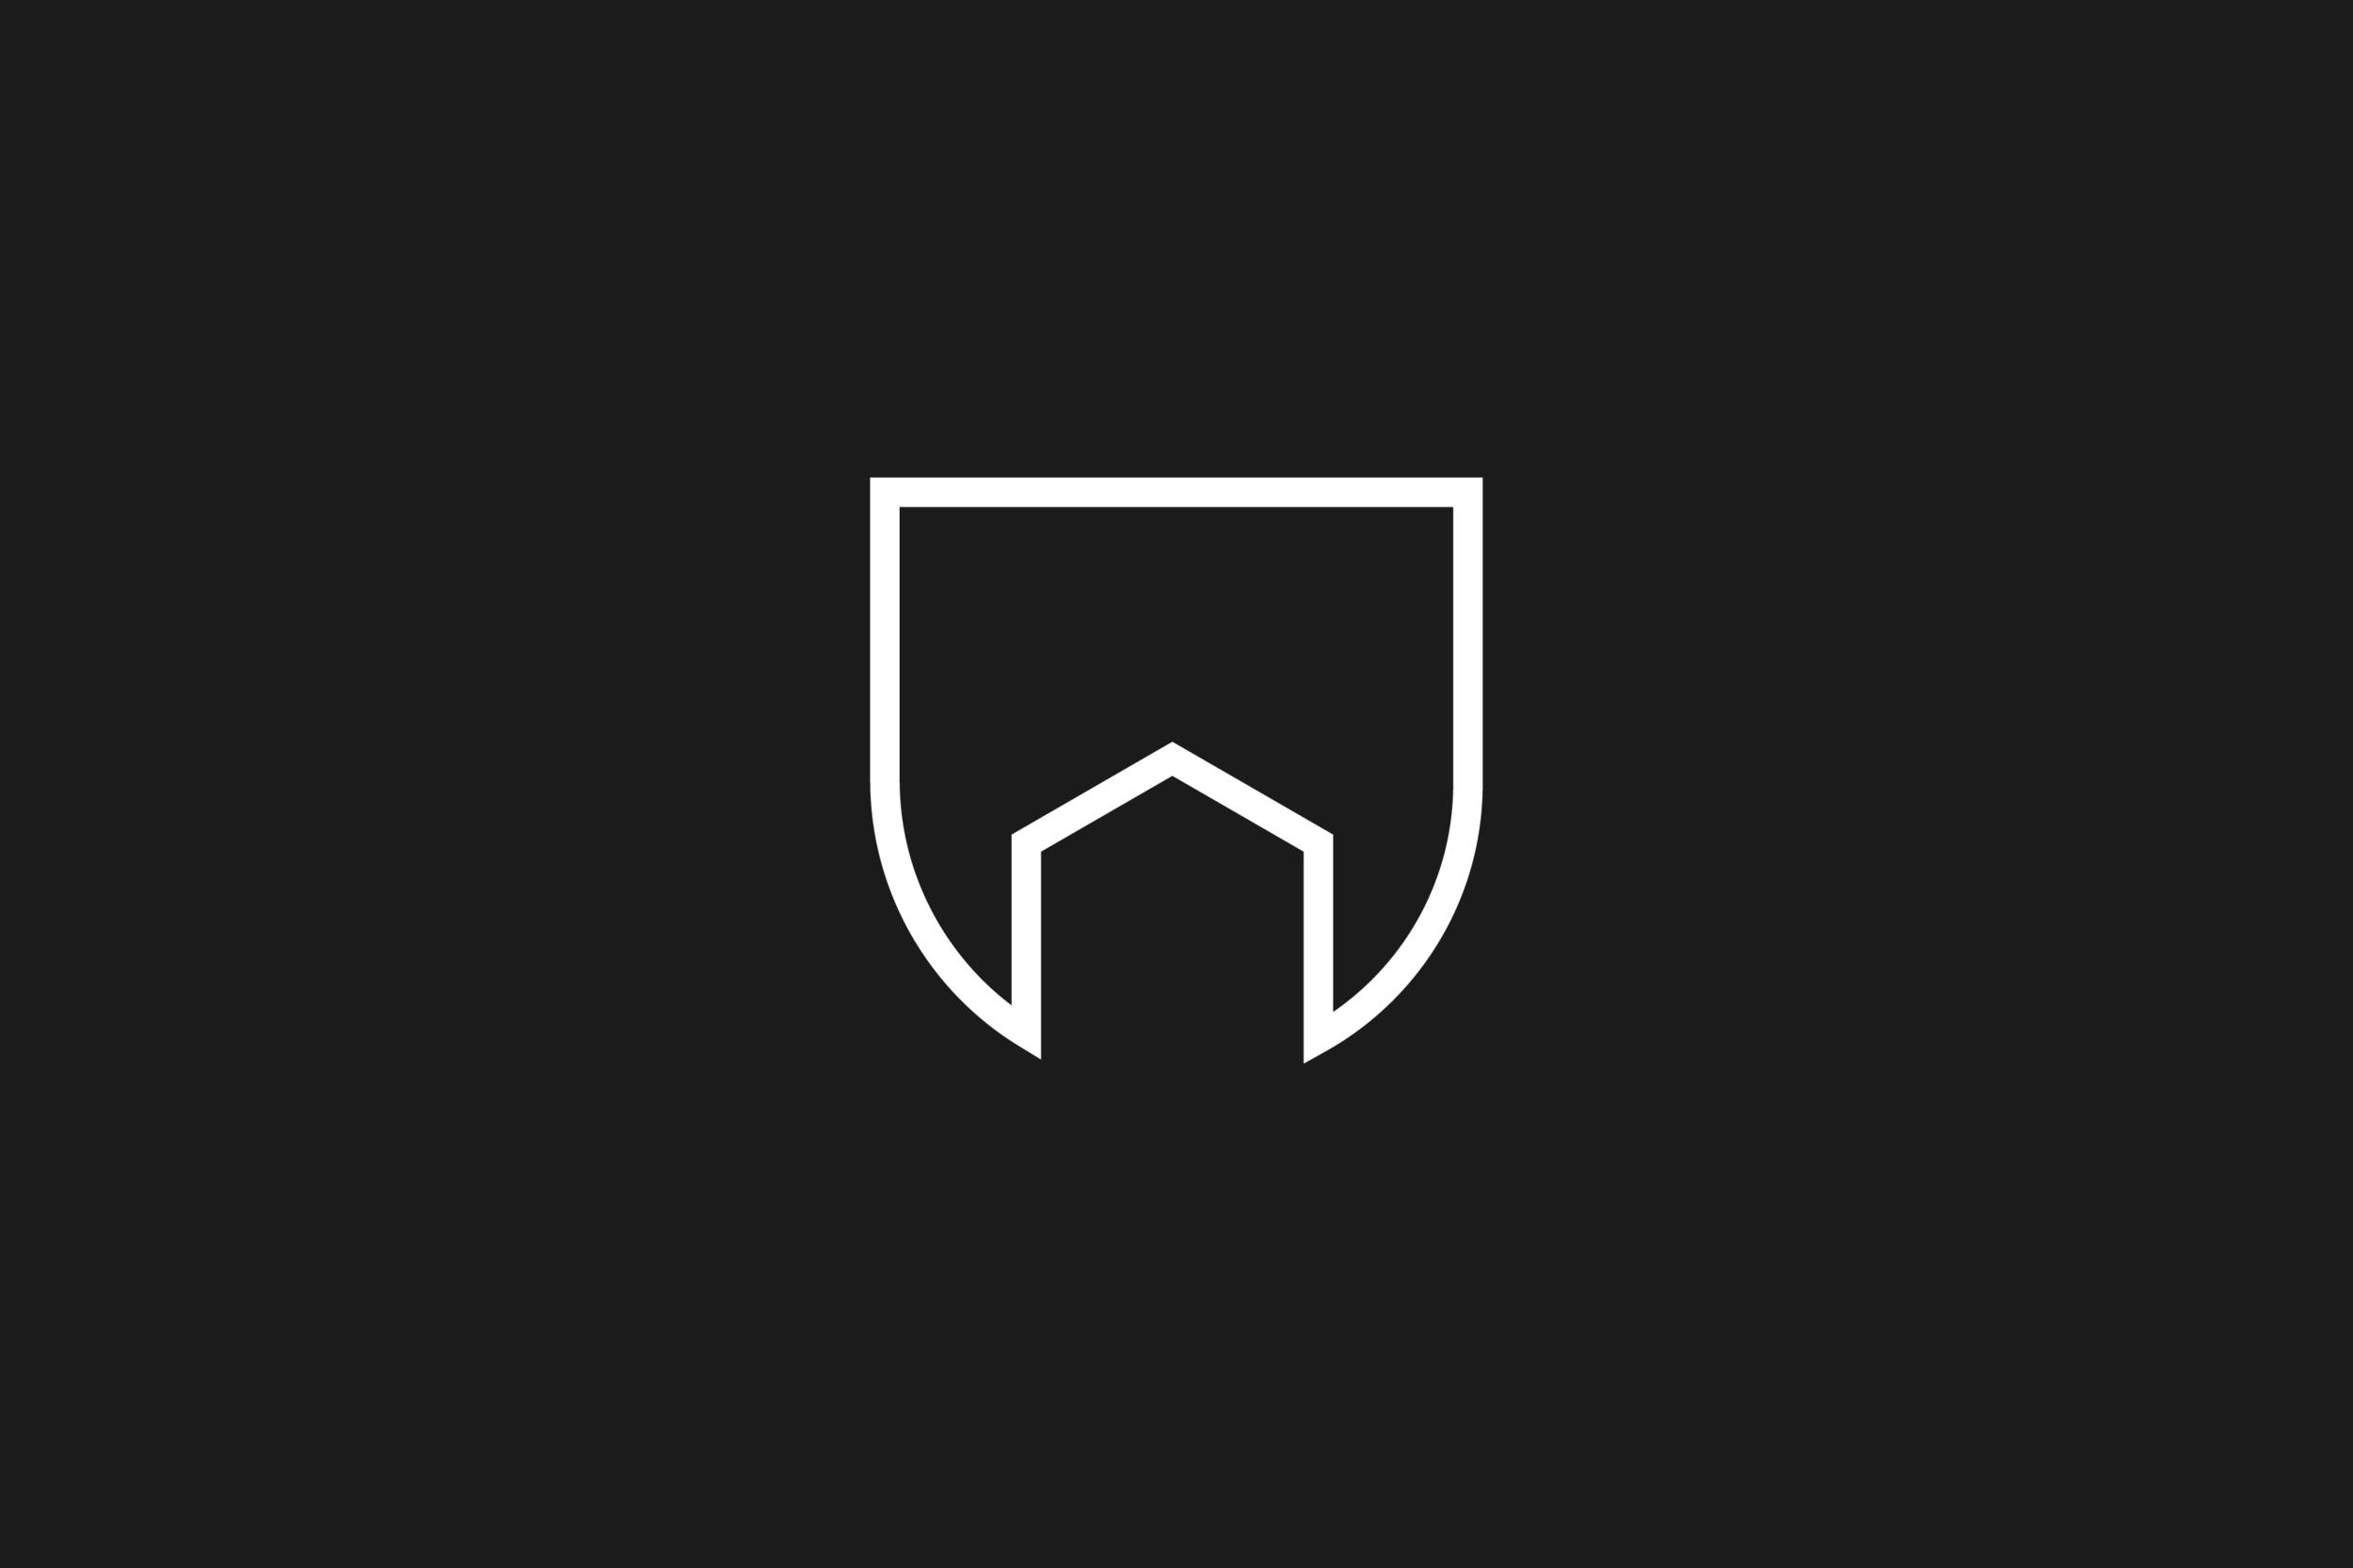 DMARC_Dienst_vastgoed.png